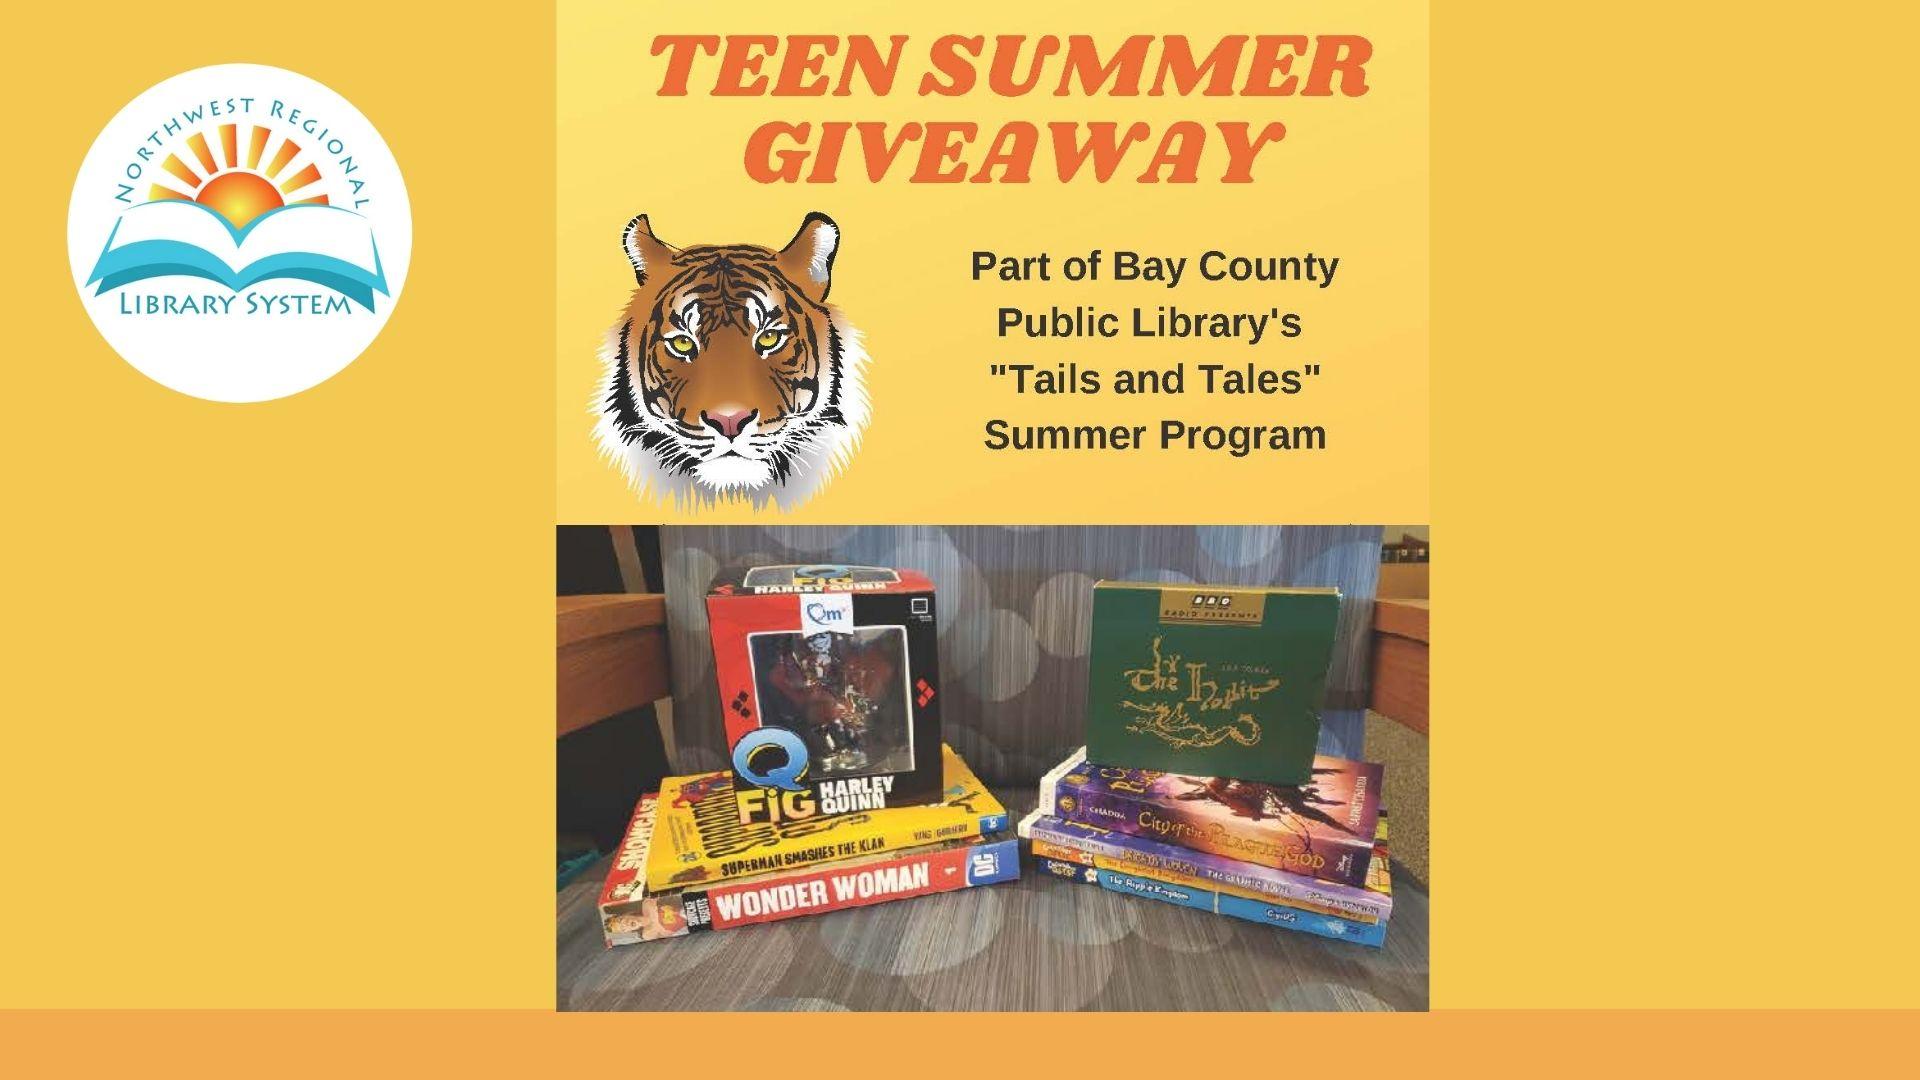 Teen Summer Giveaway